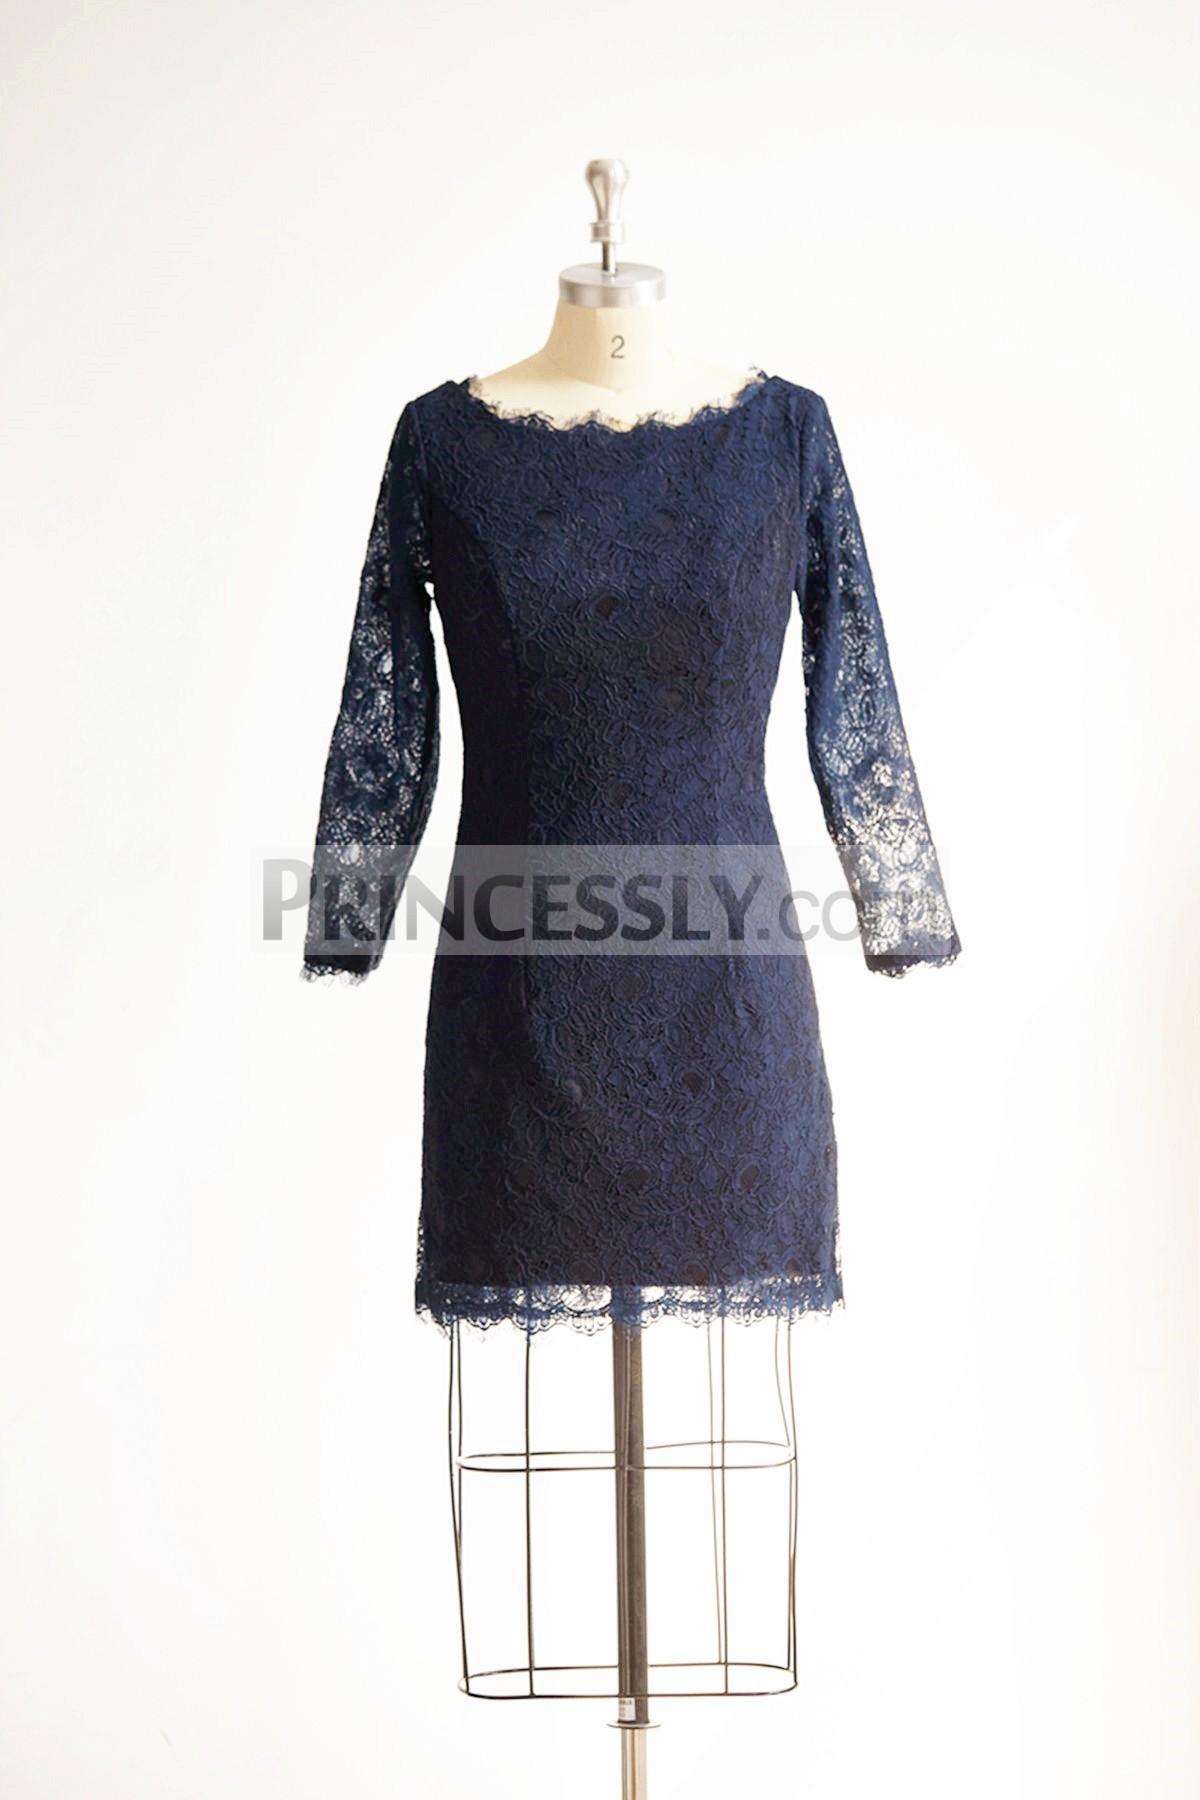 Princessly.com-K1000304-Long Sleeves Navy Blue Lace Short Wedding Bridesmaid Dress/Mother Dress-31